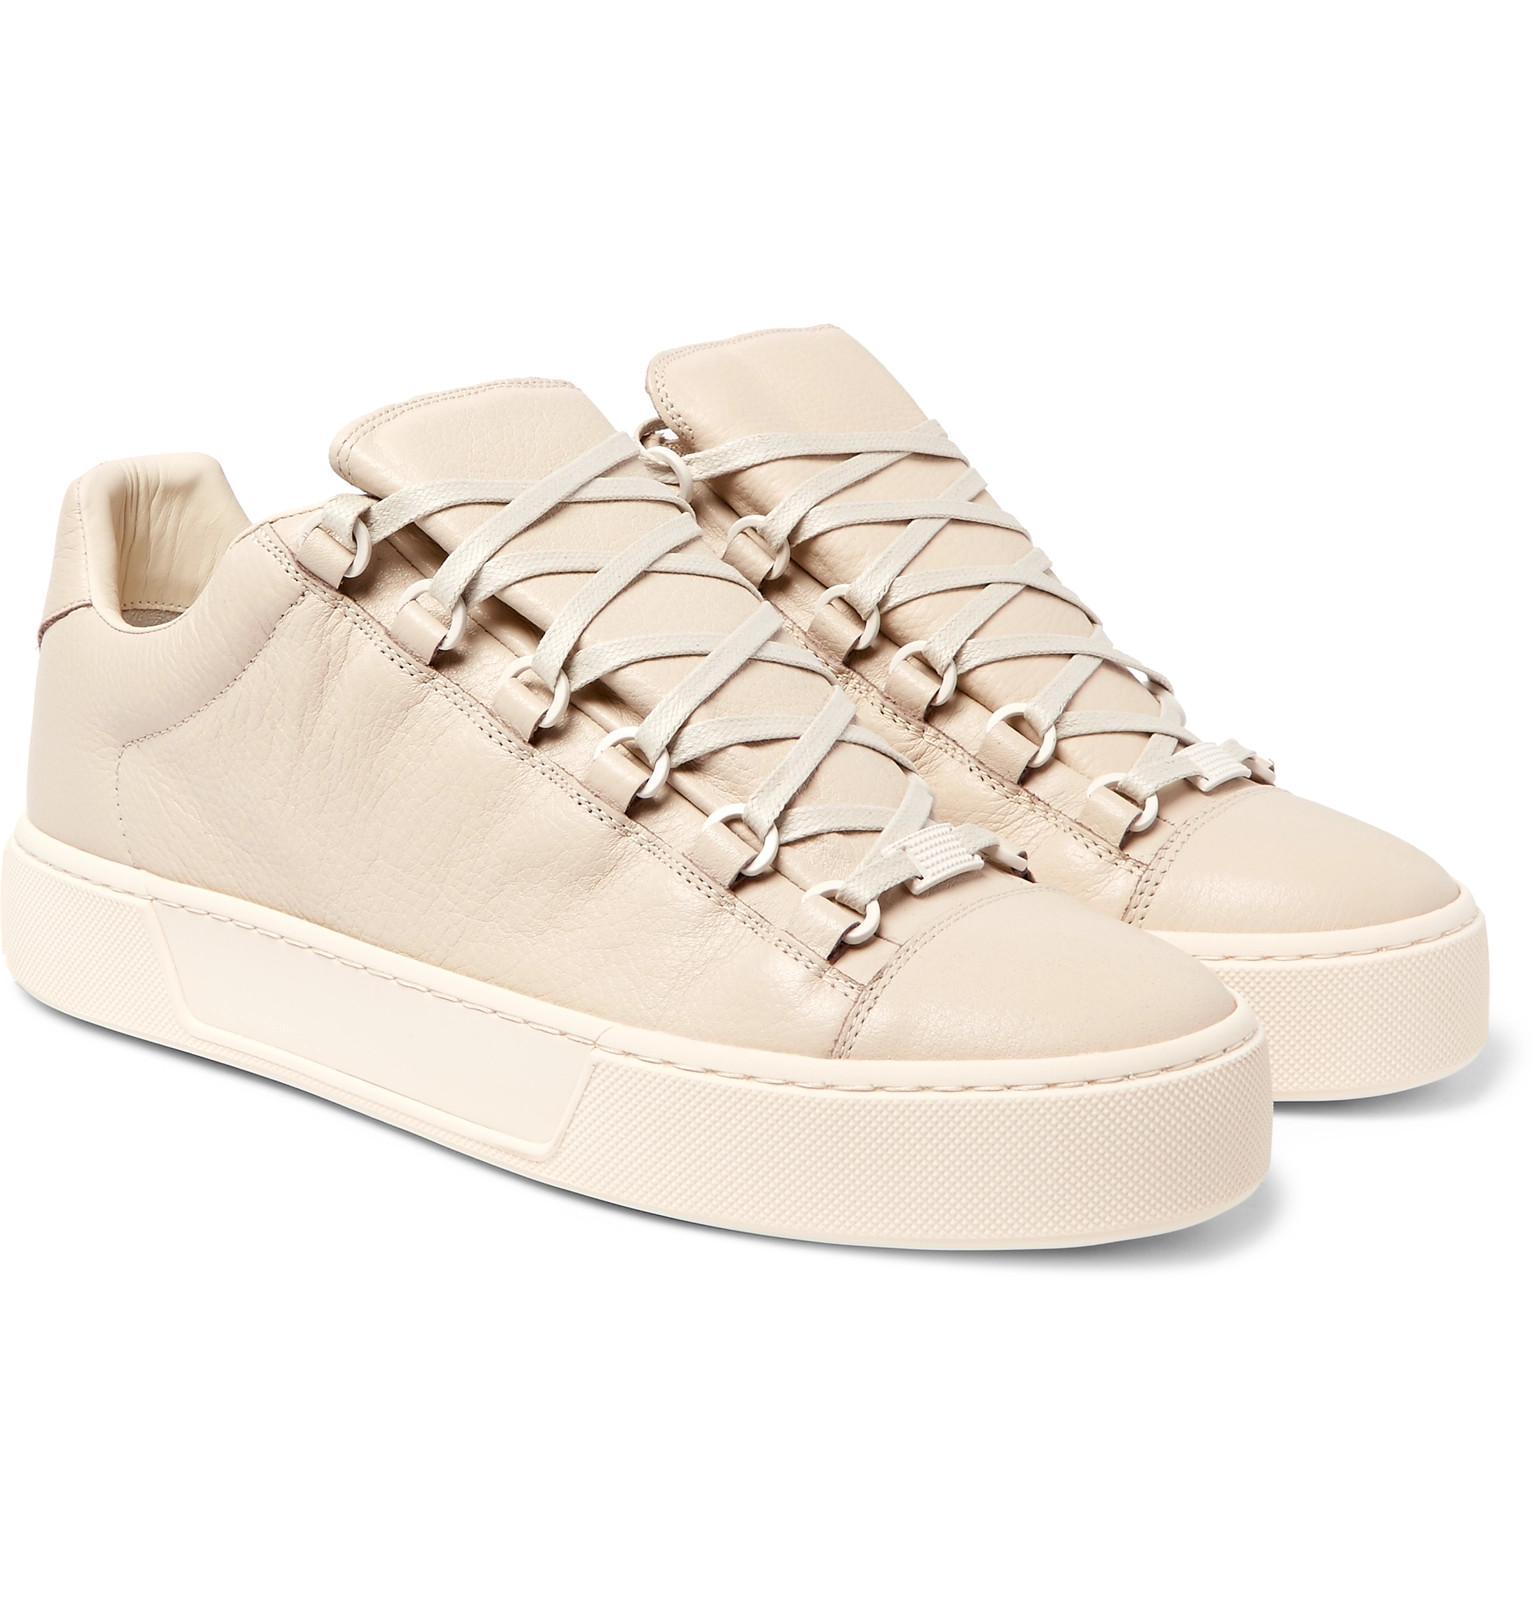 lyst balenciaga arena full grain leather sneakers for men